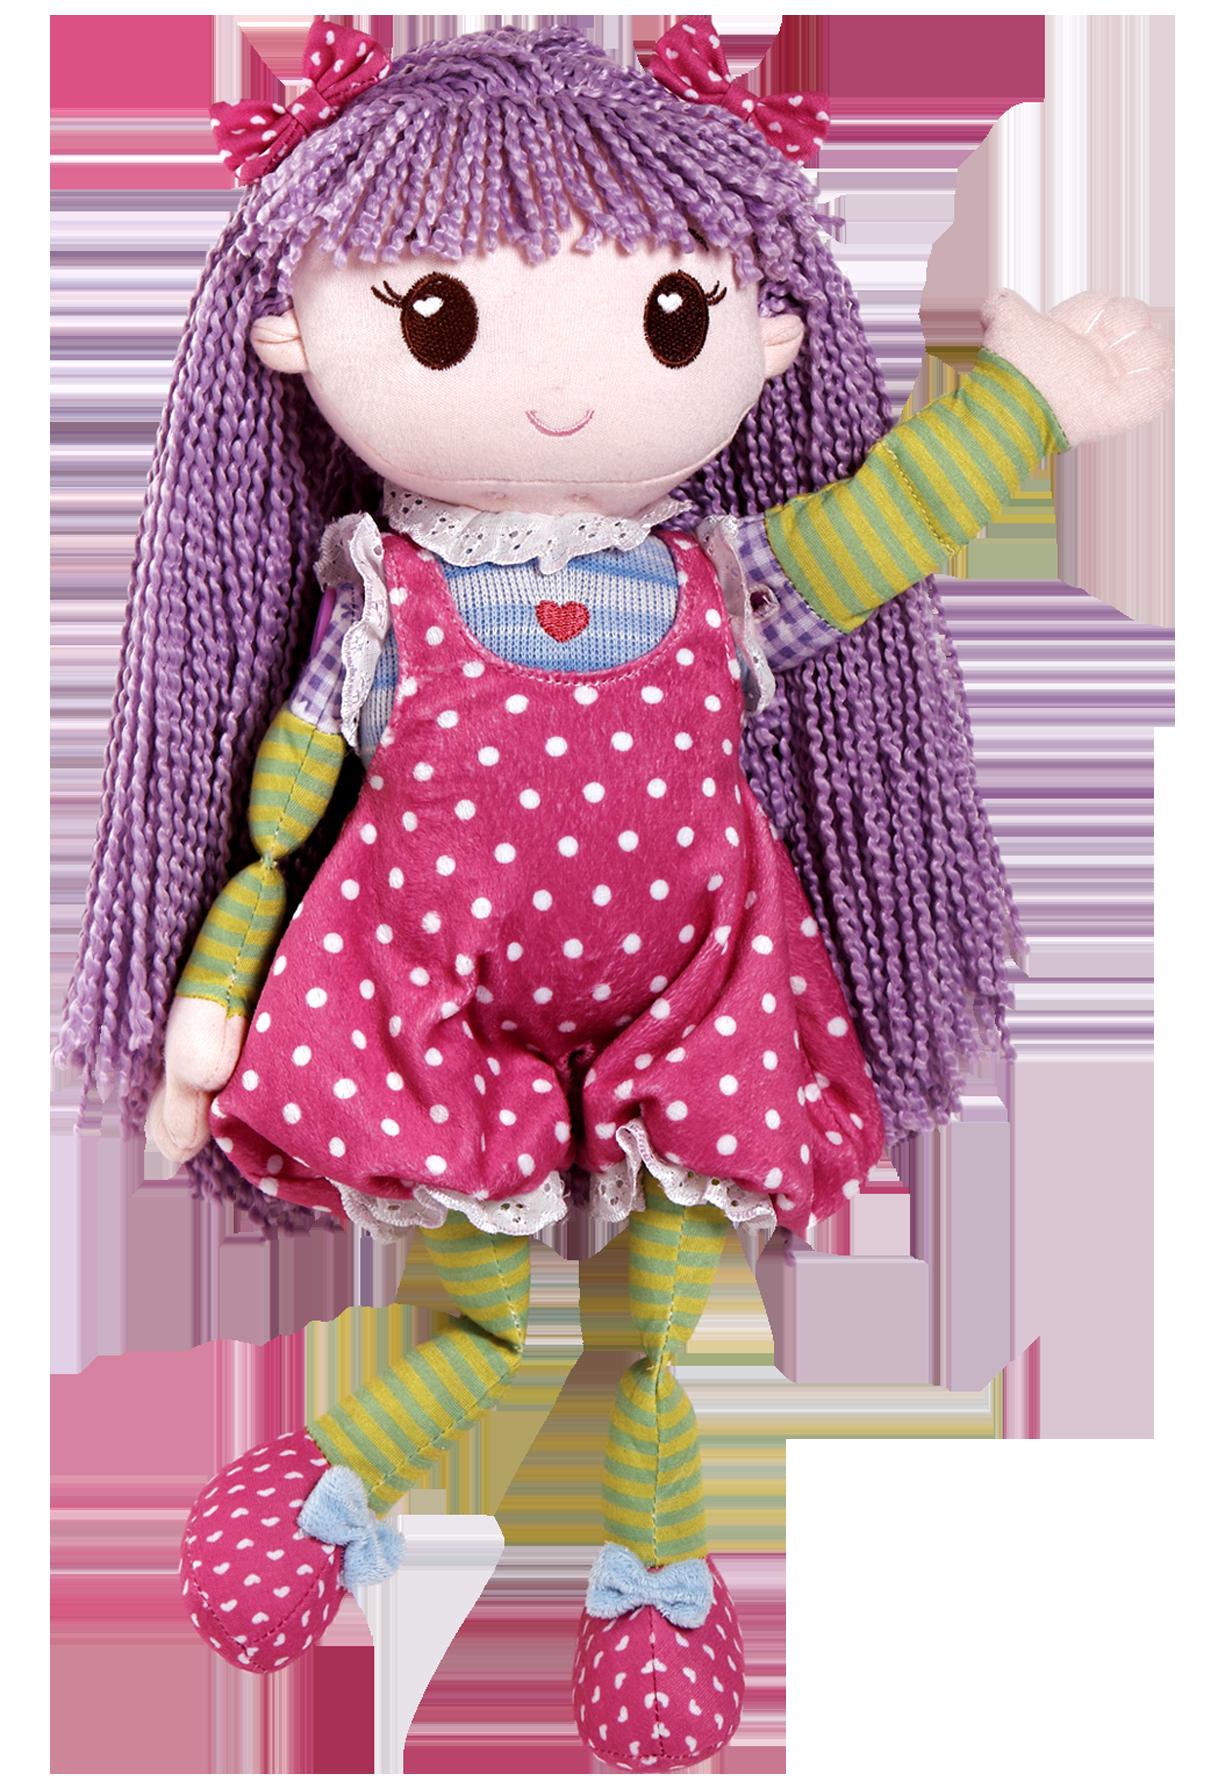 Rag Doll PNG - 67828